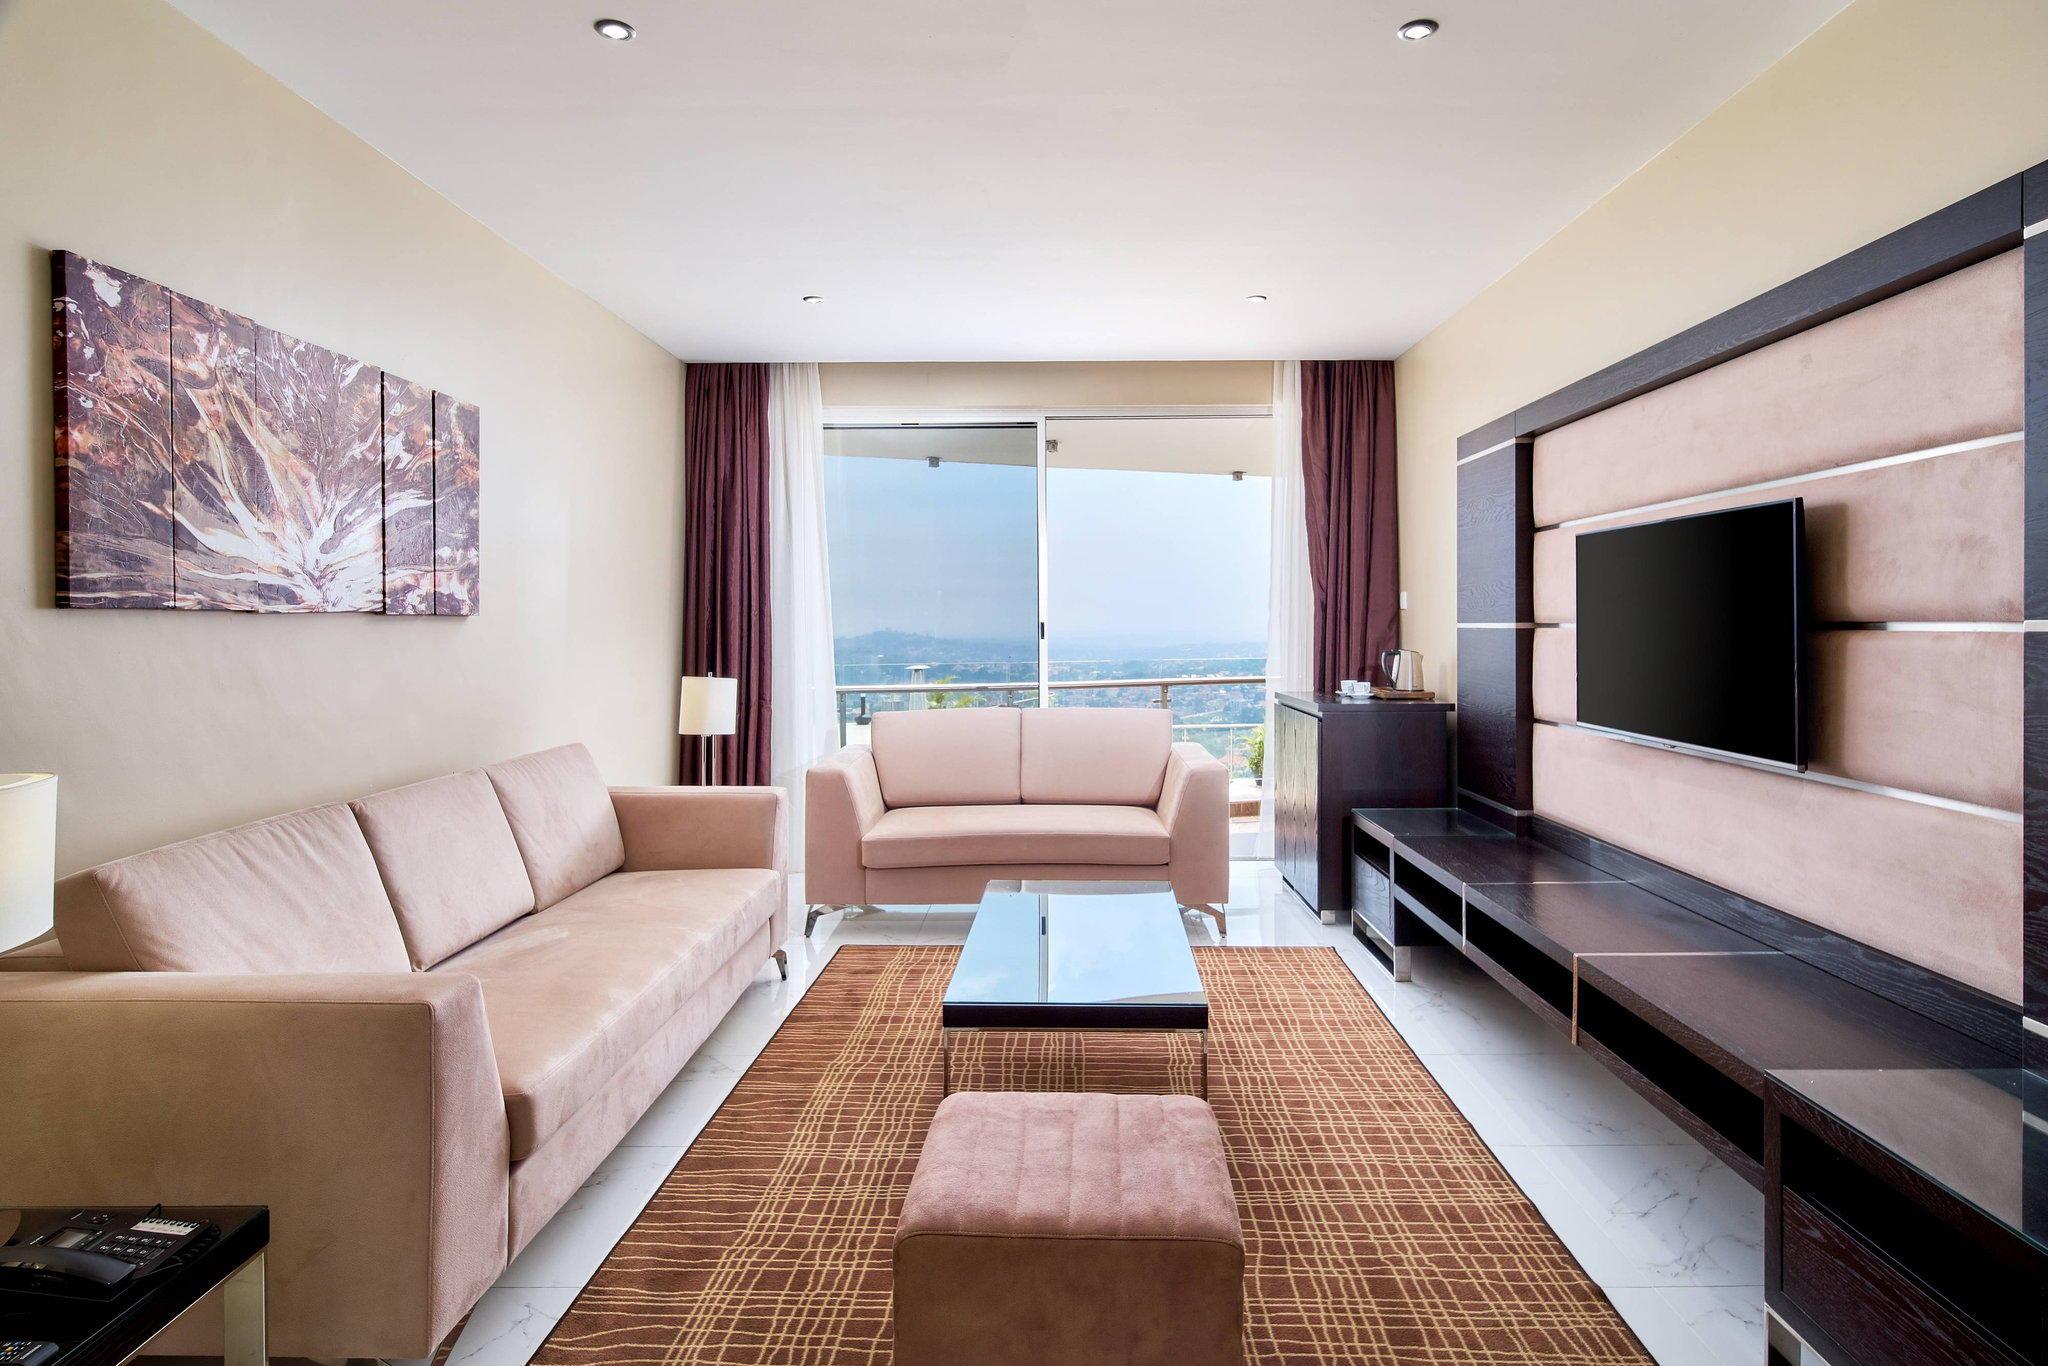 Protea Hotel by Marriott Kampala Skyz